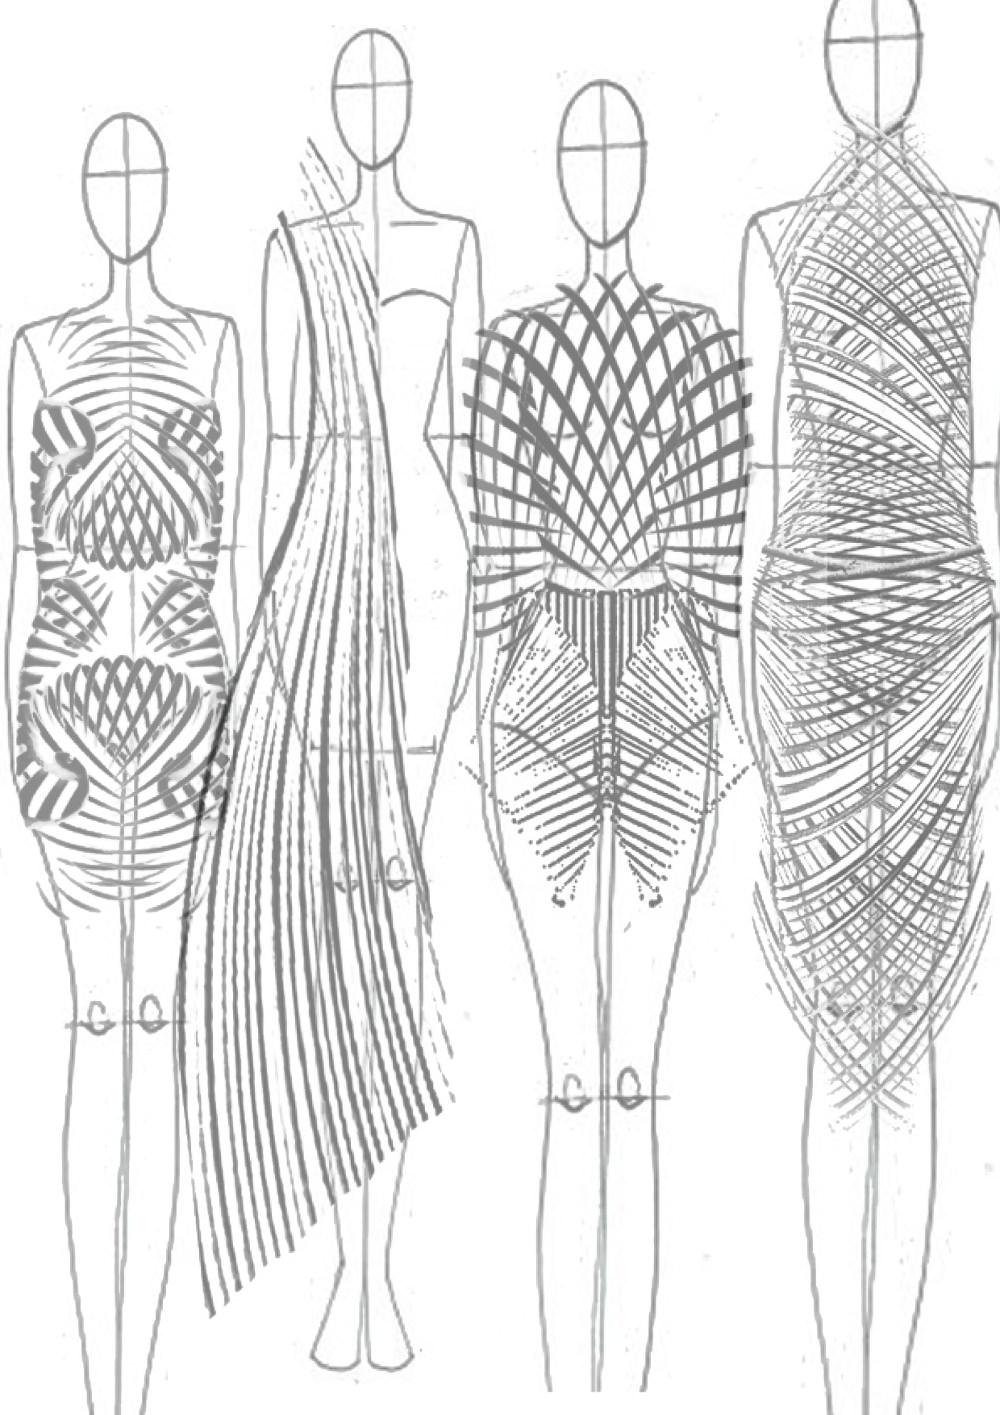 Croquis - Collection Unapologetic Body par Rochaele Siobhan